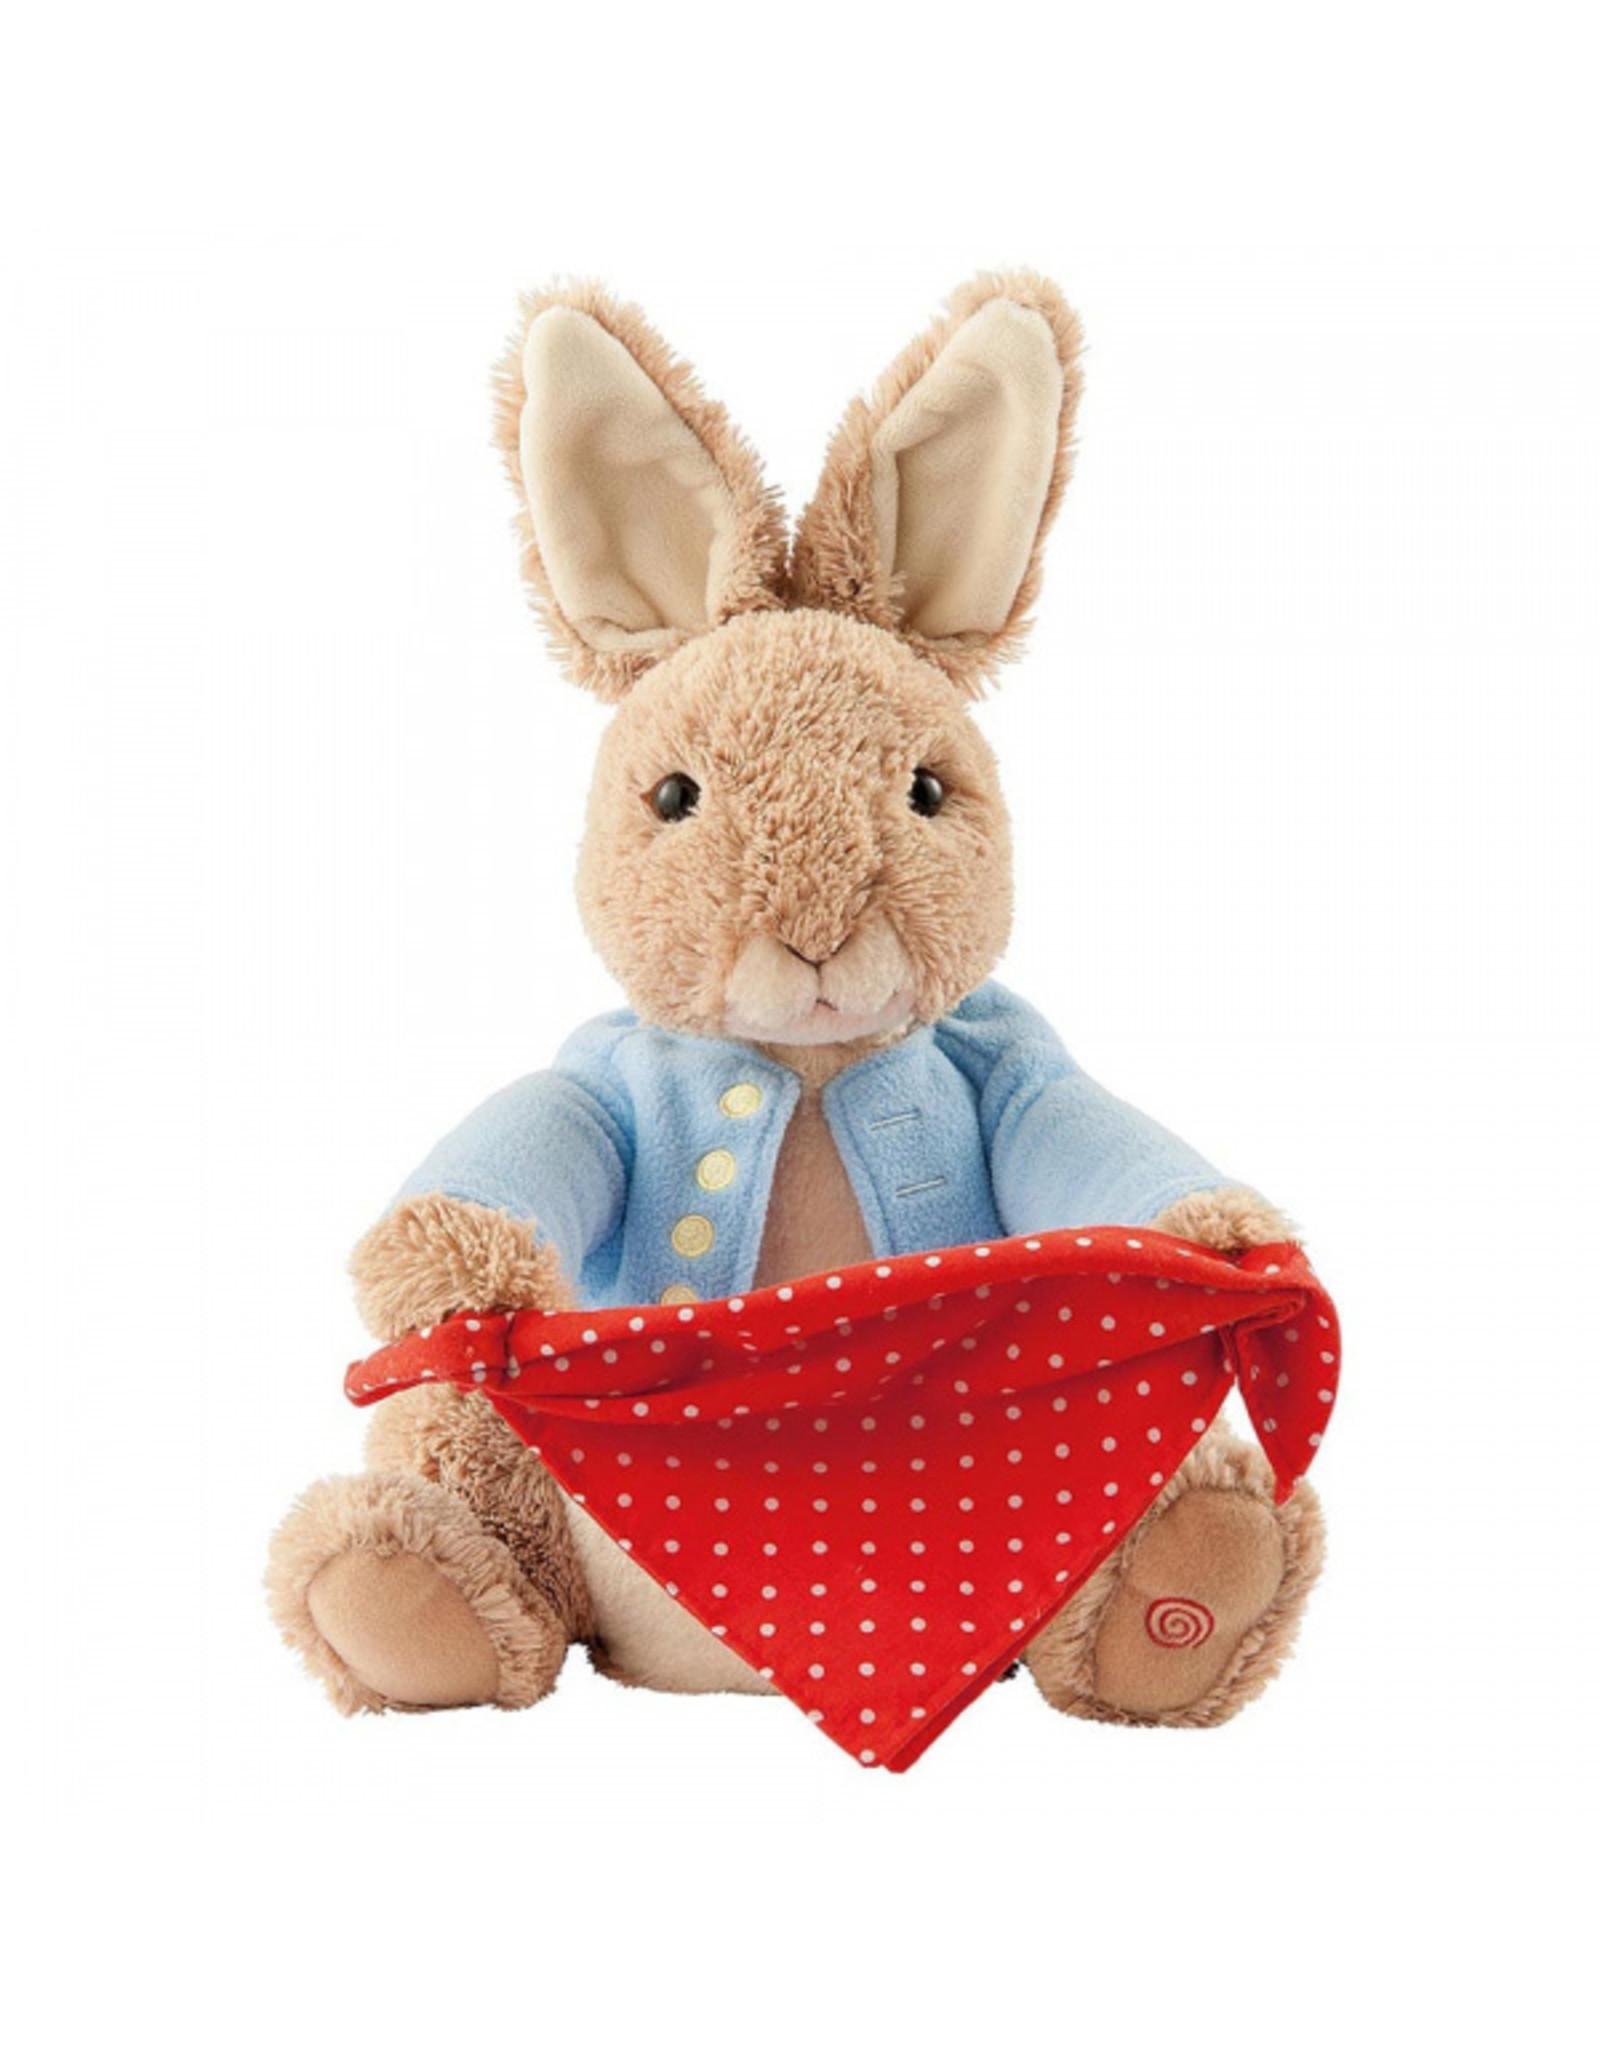 Enesco Peter Rabbit Peek-a-Boo